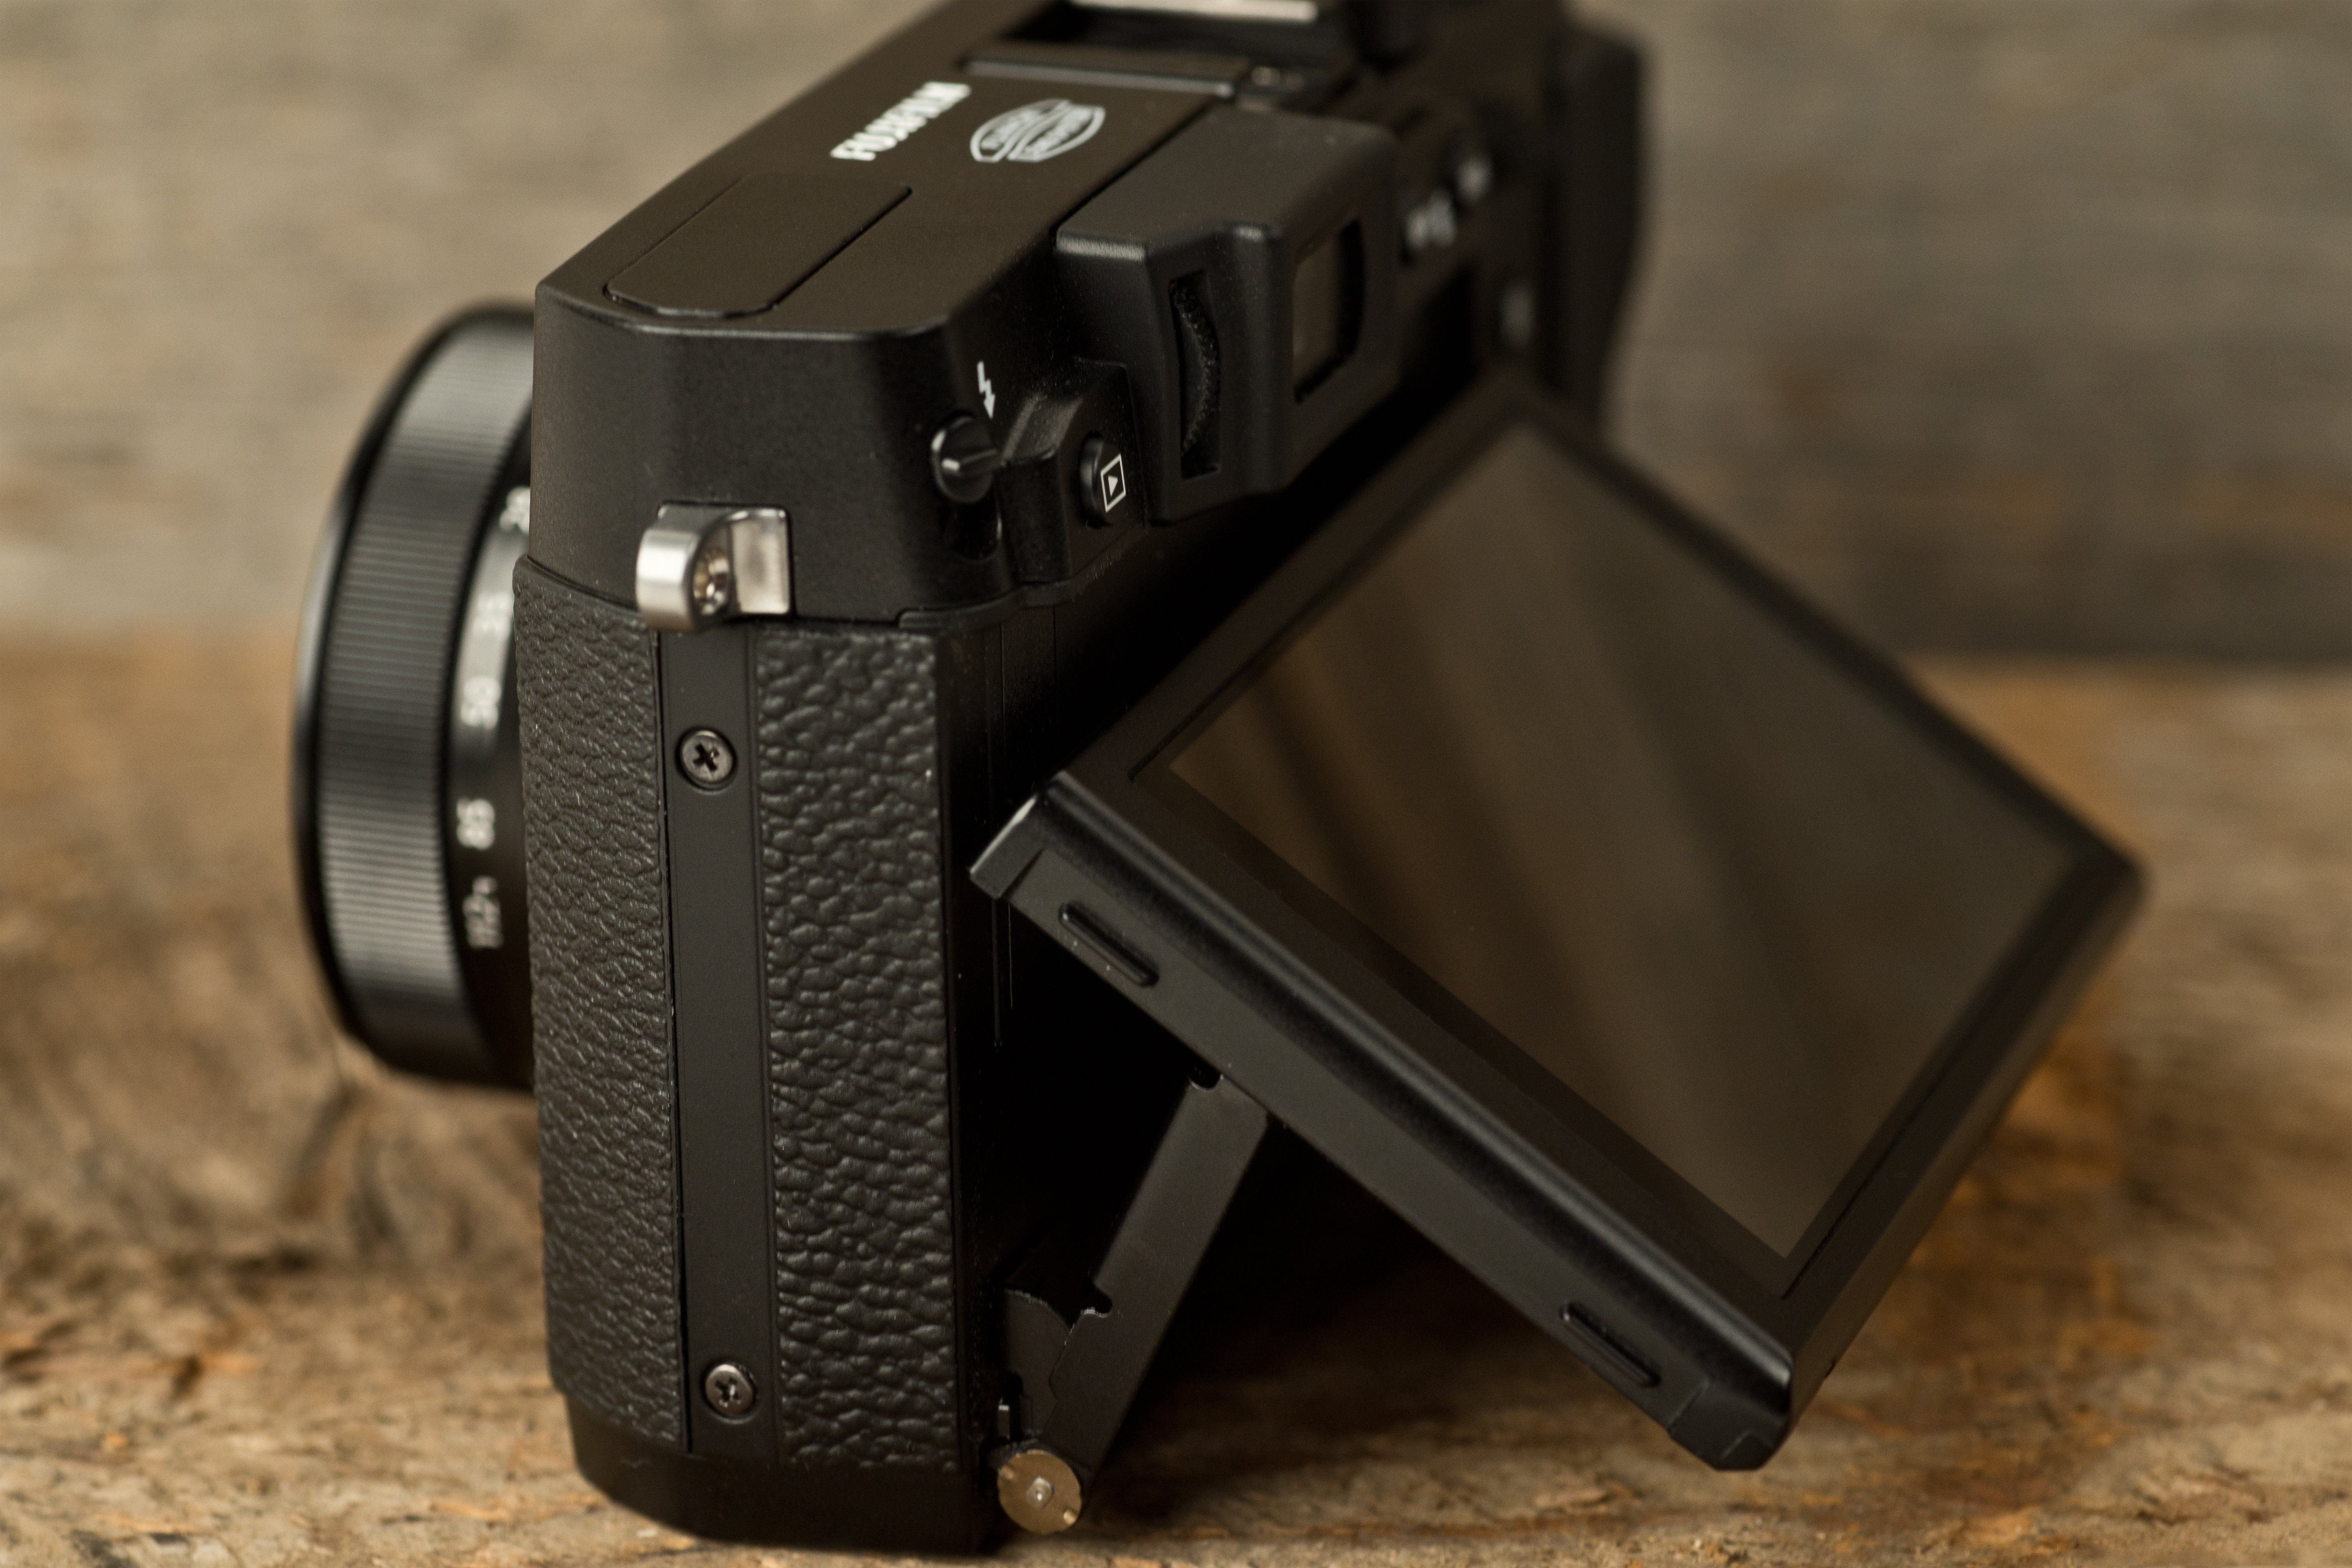 A photo of the Fujifilm X30's tilting screen.